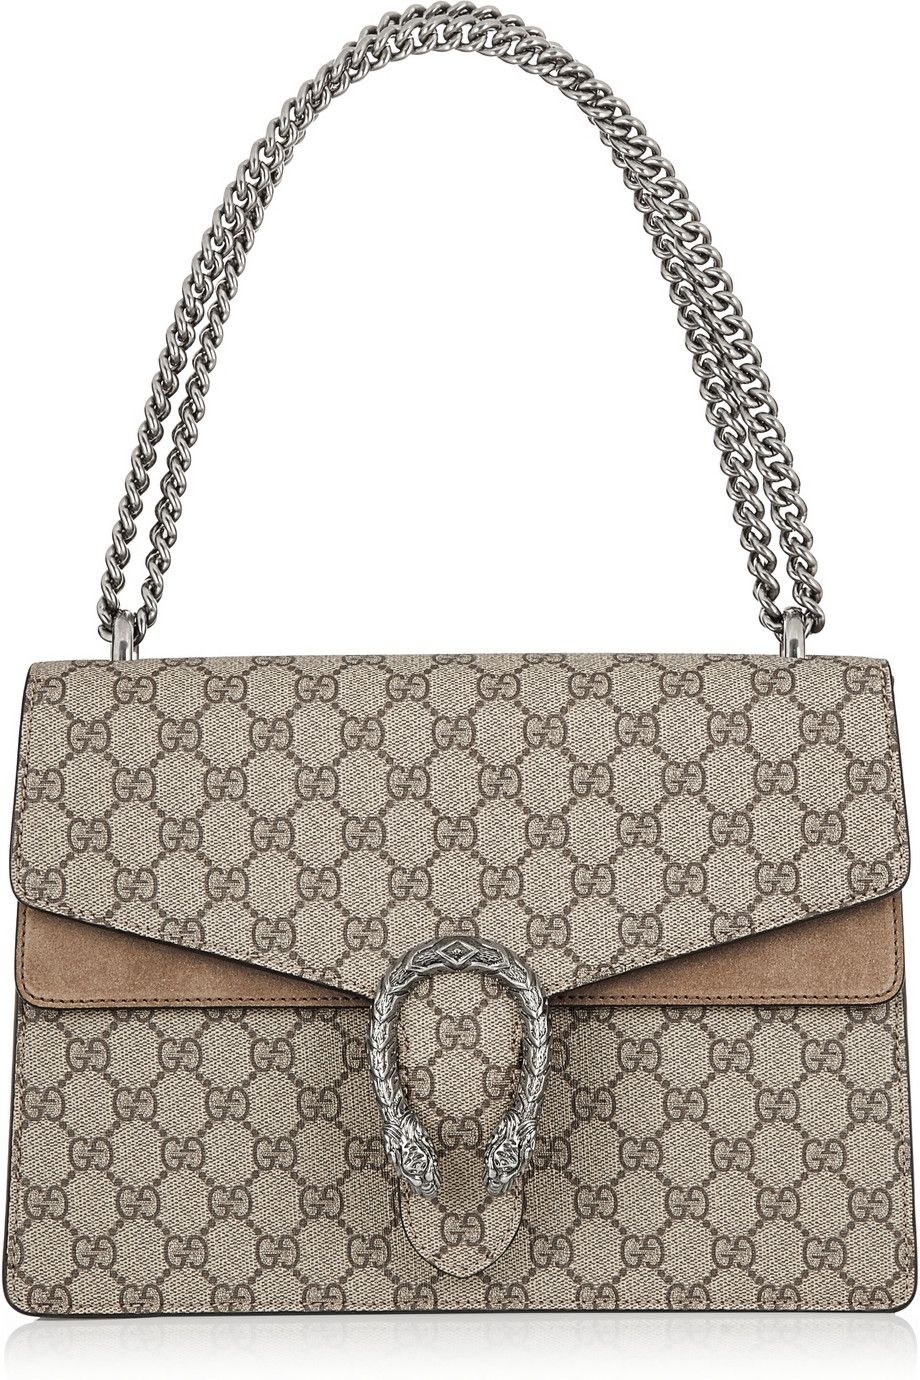 8ef7027689d5 Gucci | Dionysus coated canvas and suede shoulder bag | NET-A-PORTER.COM